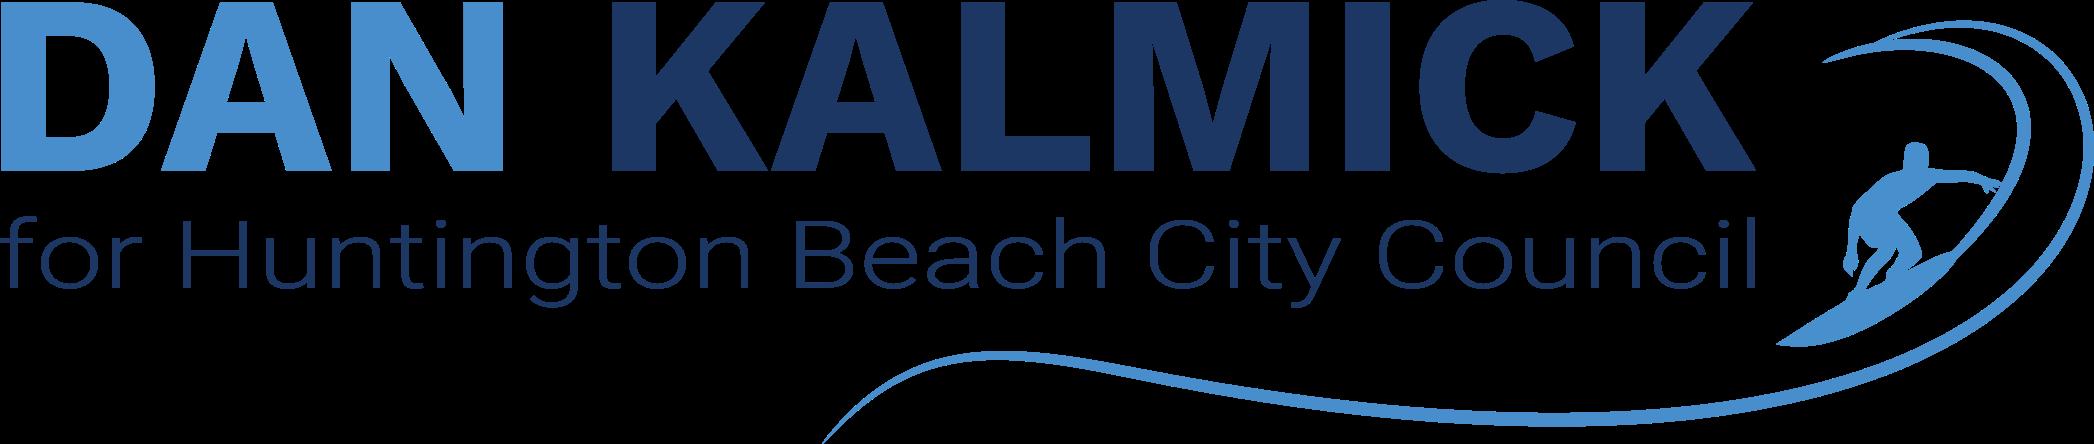 Dan Kalmick for Huntington Beach City Council